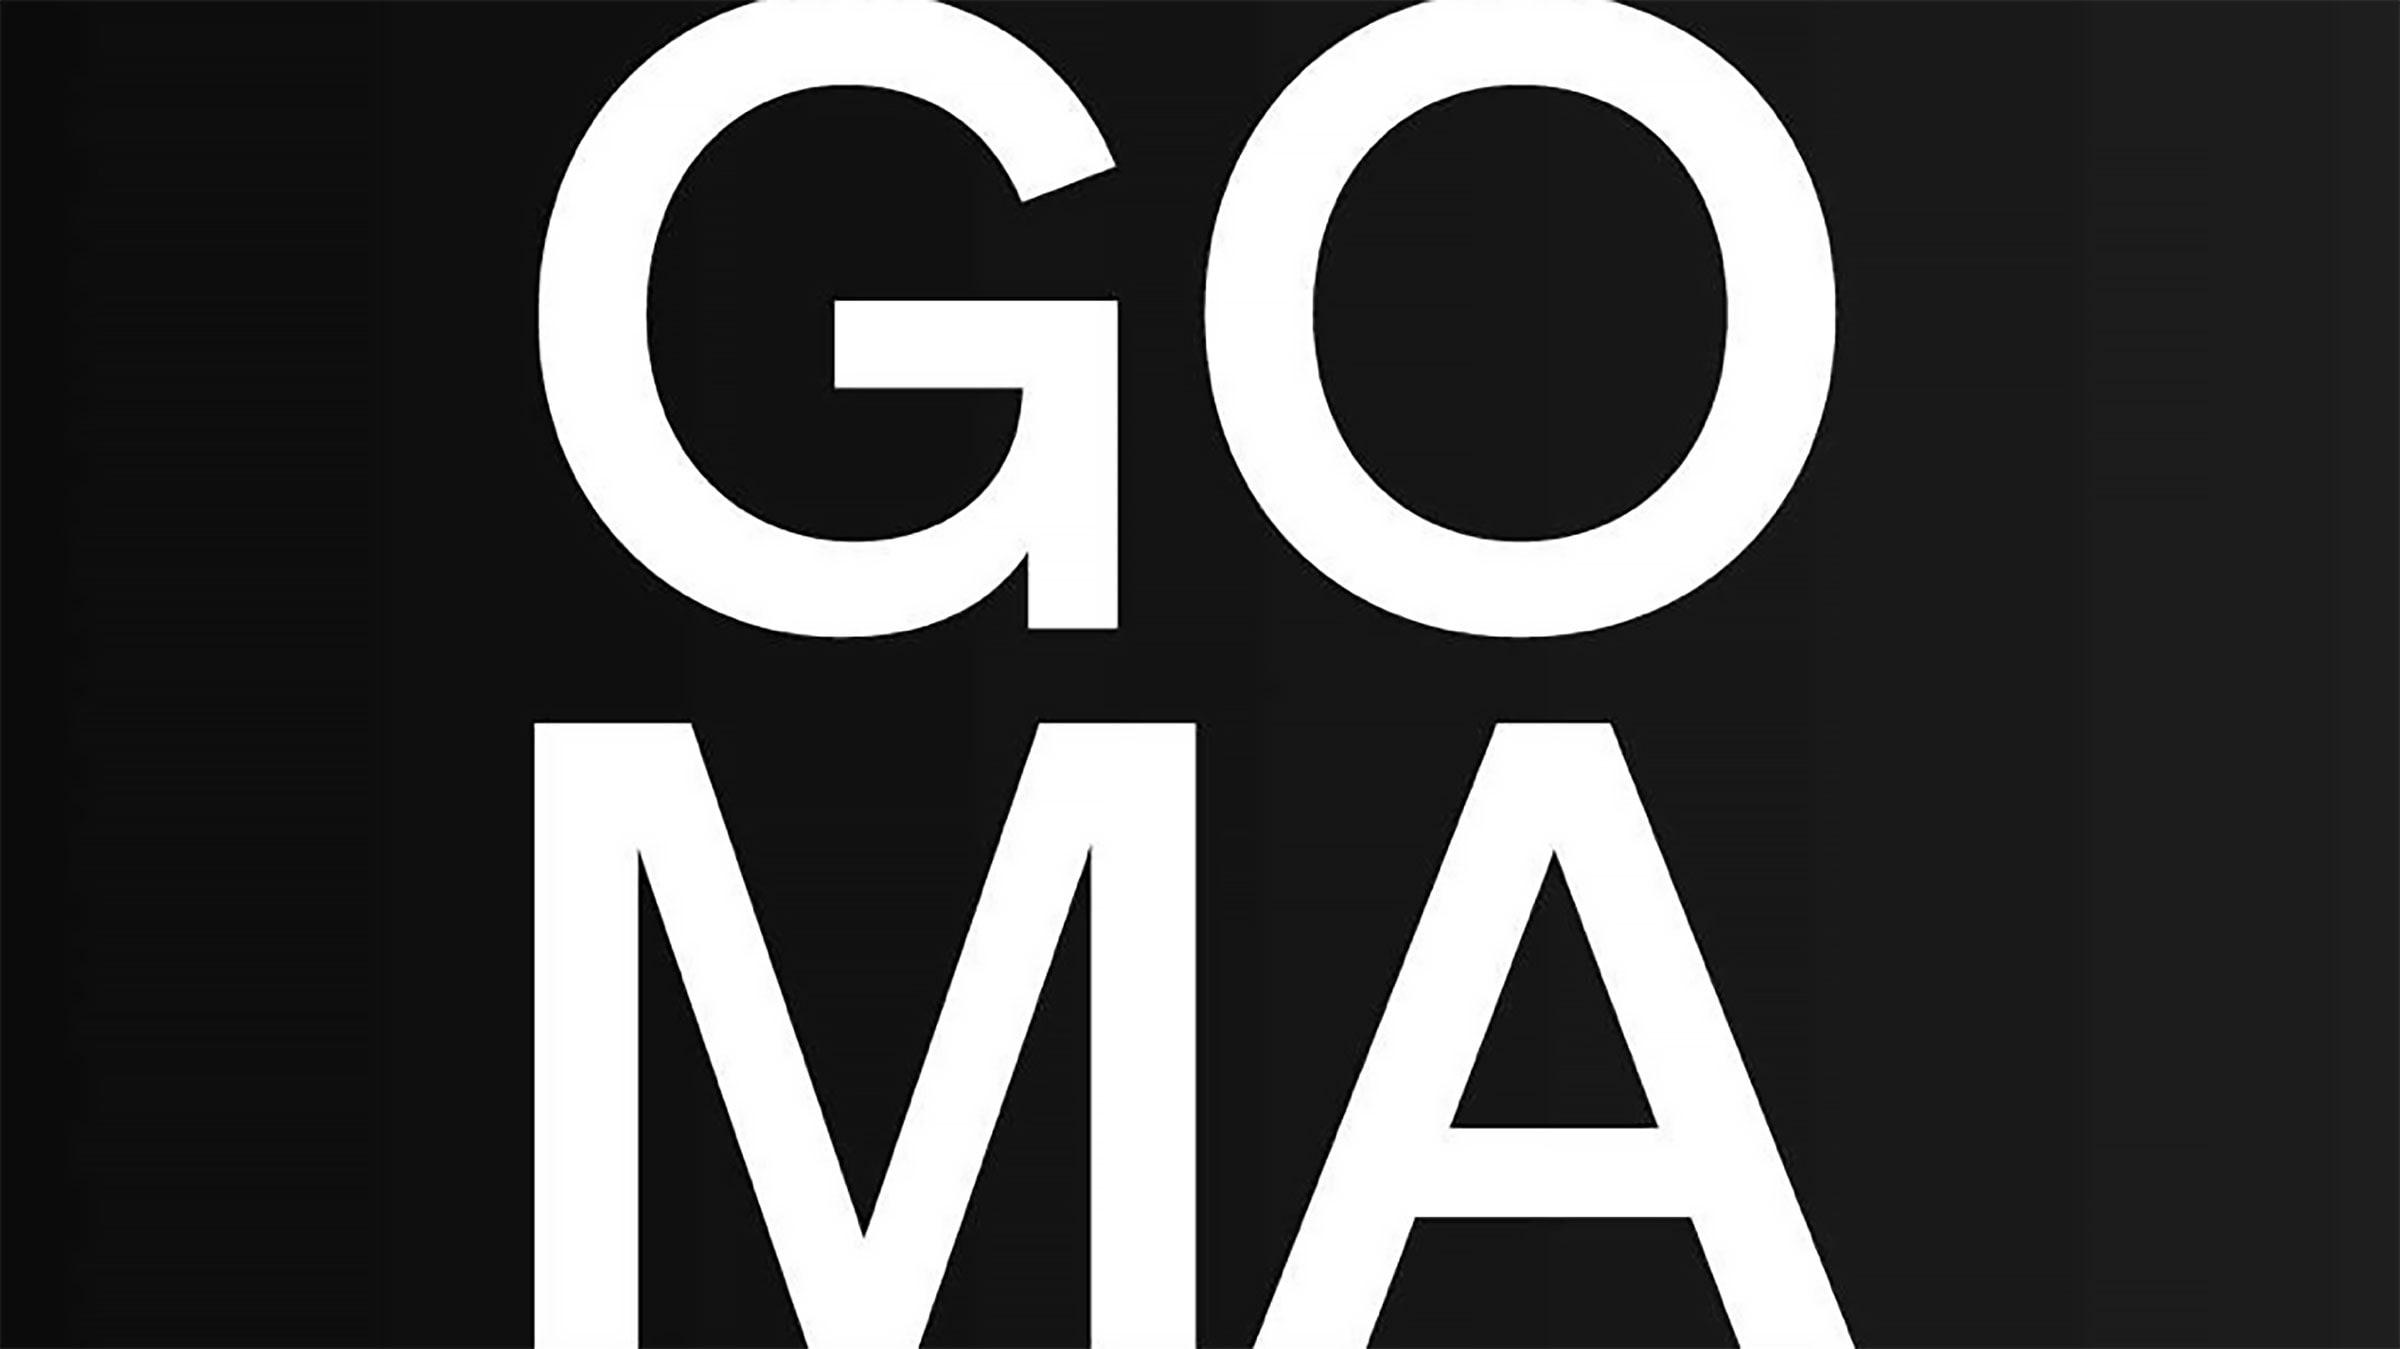 Nu öppnar Goma – Sveriges första asiatiska gastropub